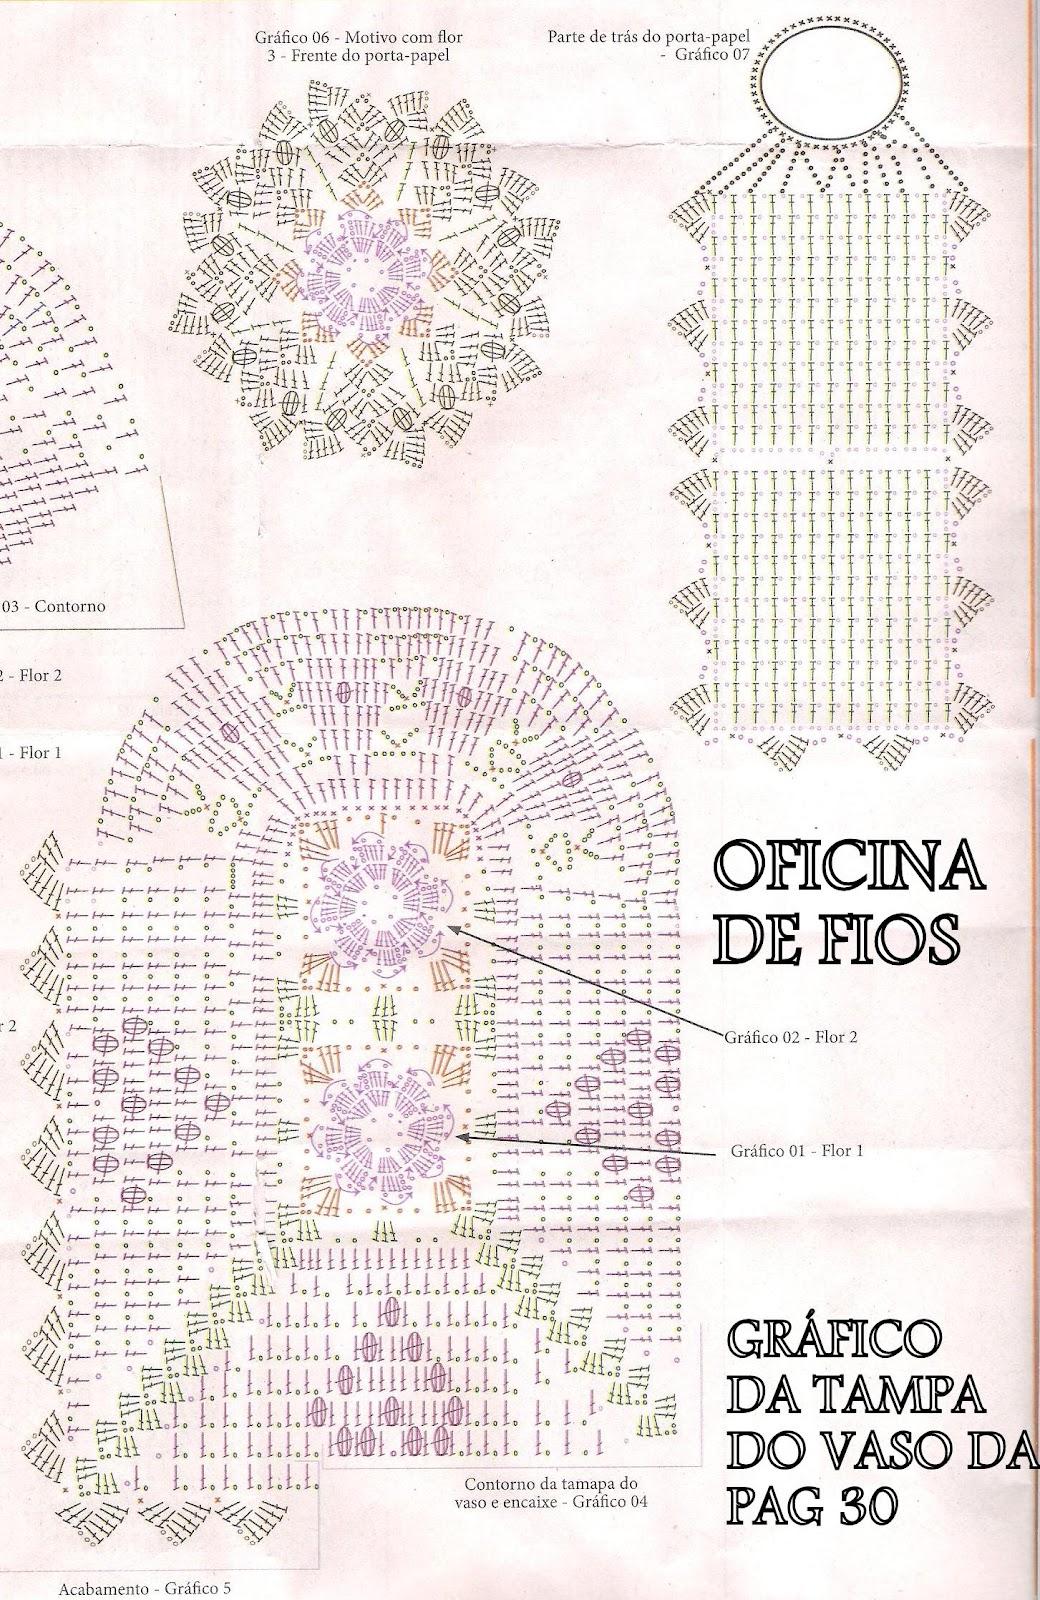 OFICINA DE FIOS